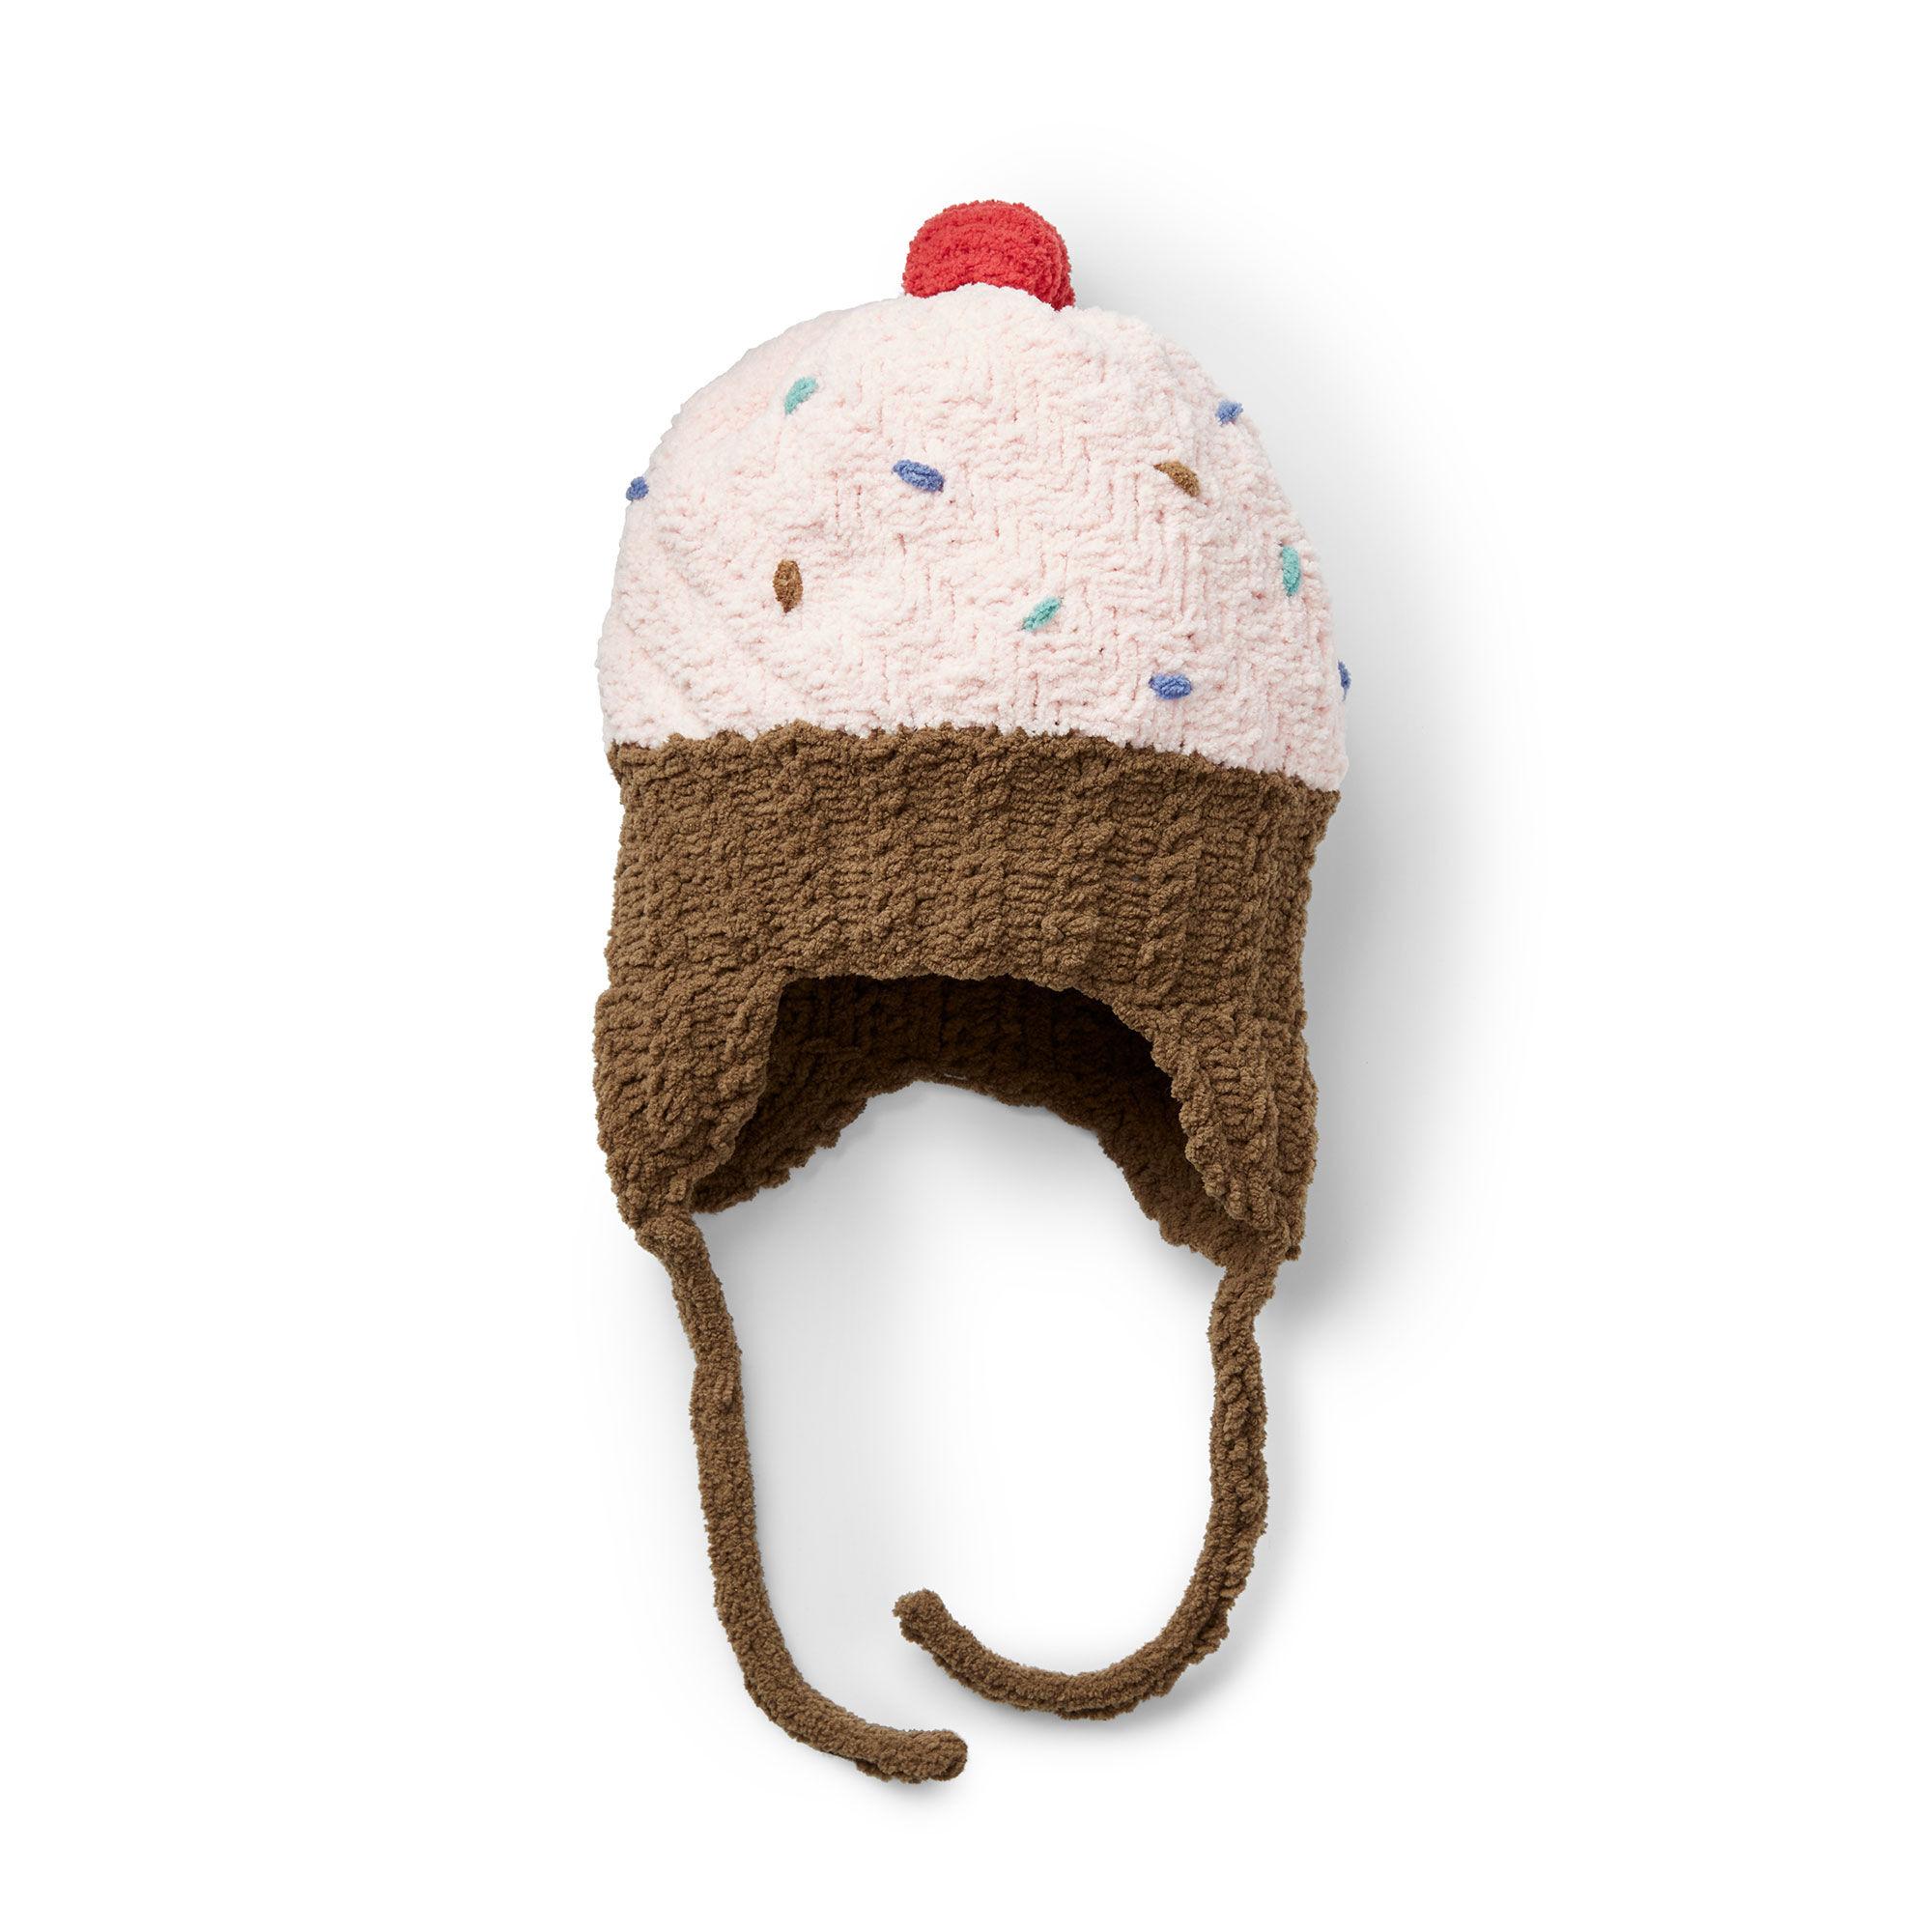 Bernat Red Velvet Knit Cupcake Hat, 18-24 mos Pattern | Yarnspirations